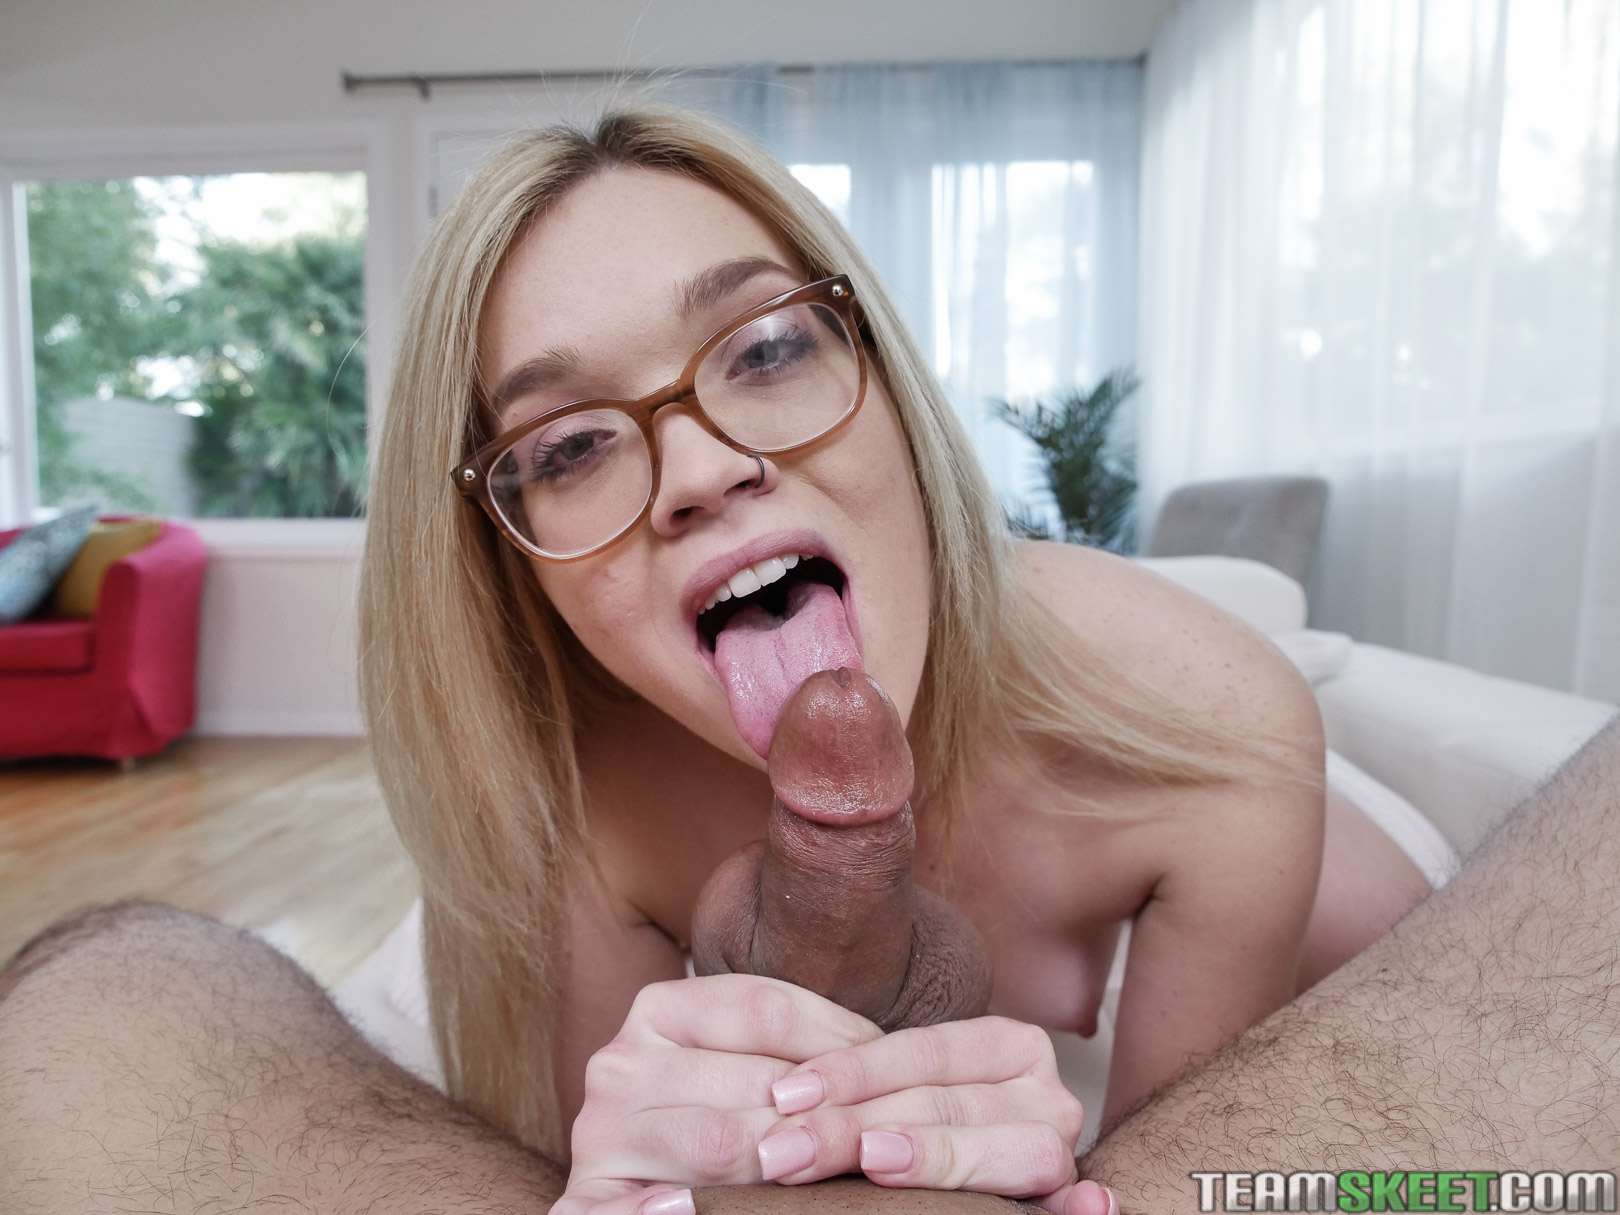 Blonde Teen Sucks Dick Pov